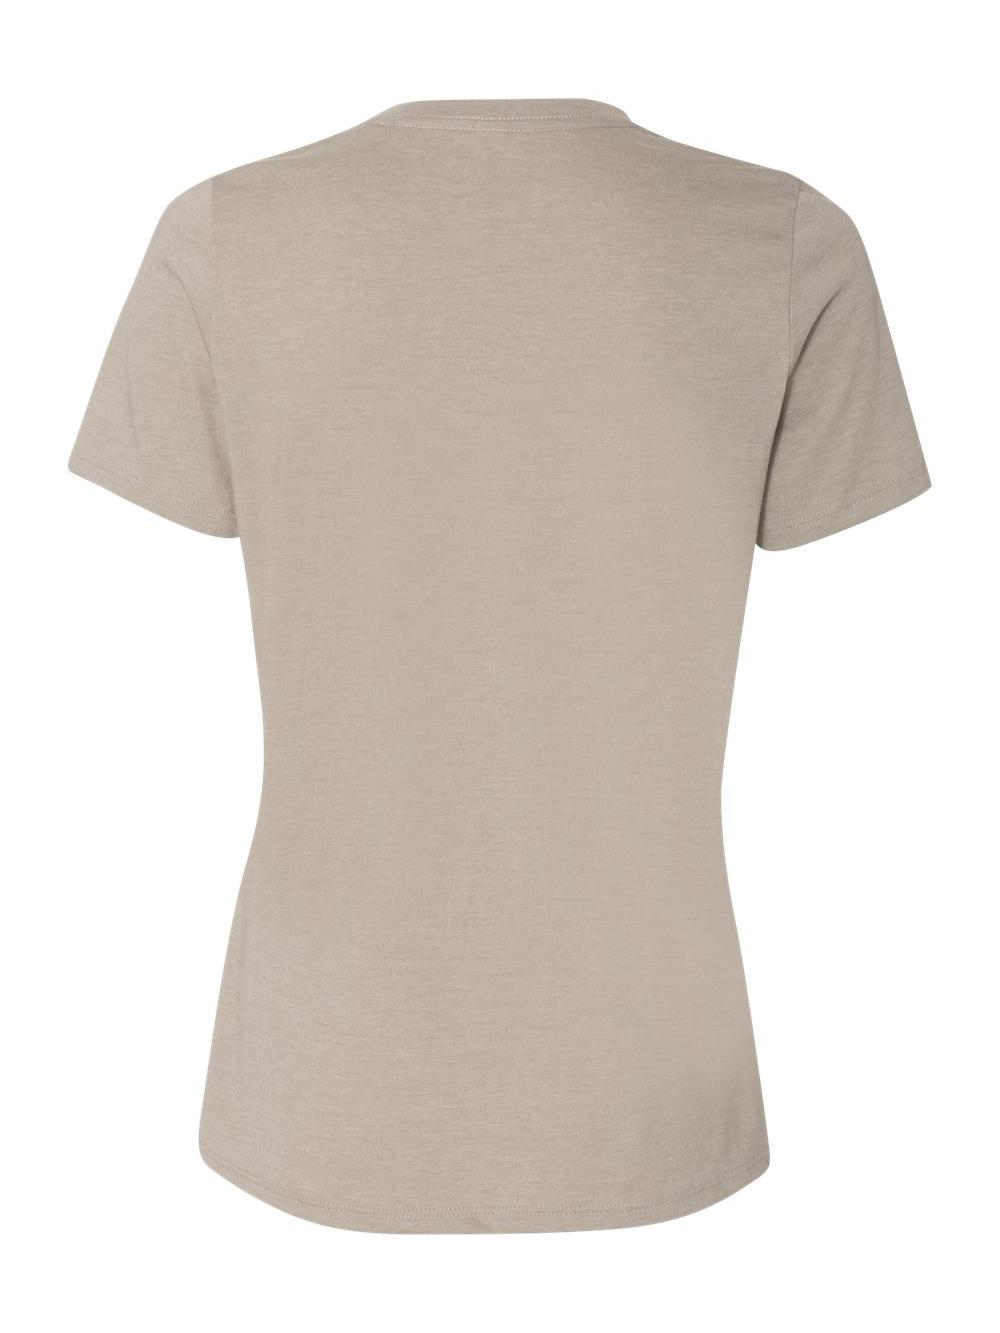 Bella-Canvas-Women-039-s-Relaxed-Short-Sleeve-Jersey-Tee-6400 thumbnail 43